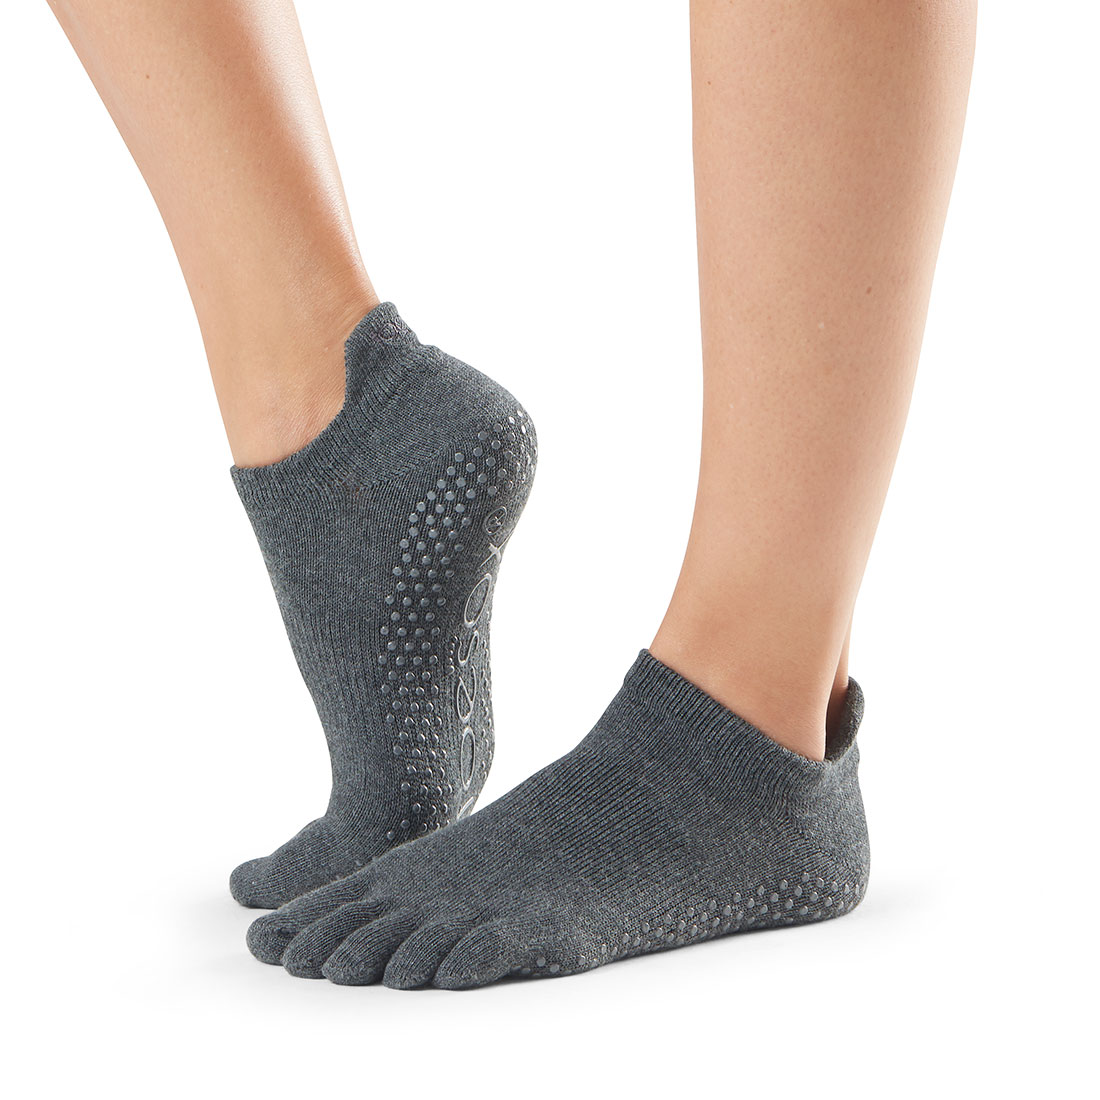 Yogasocken ToeSox Low Rise Full Toe Charcoal Grey - 1